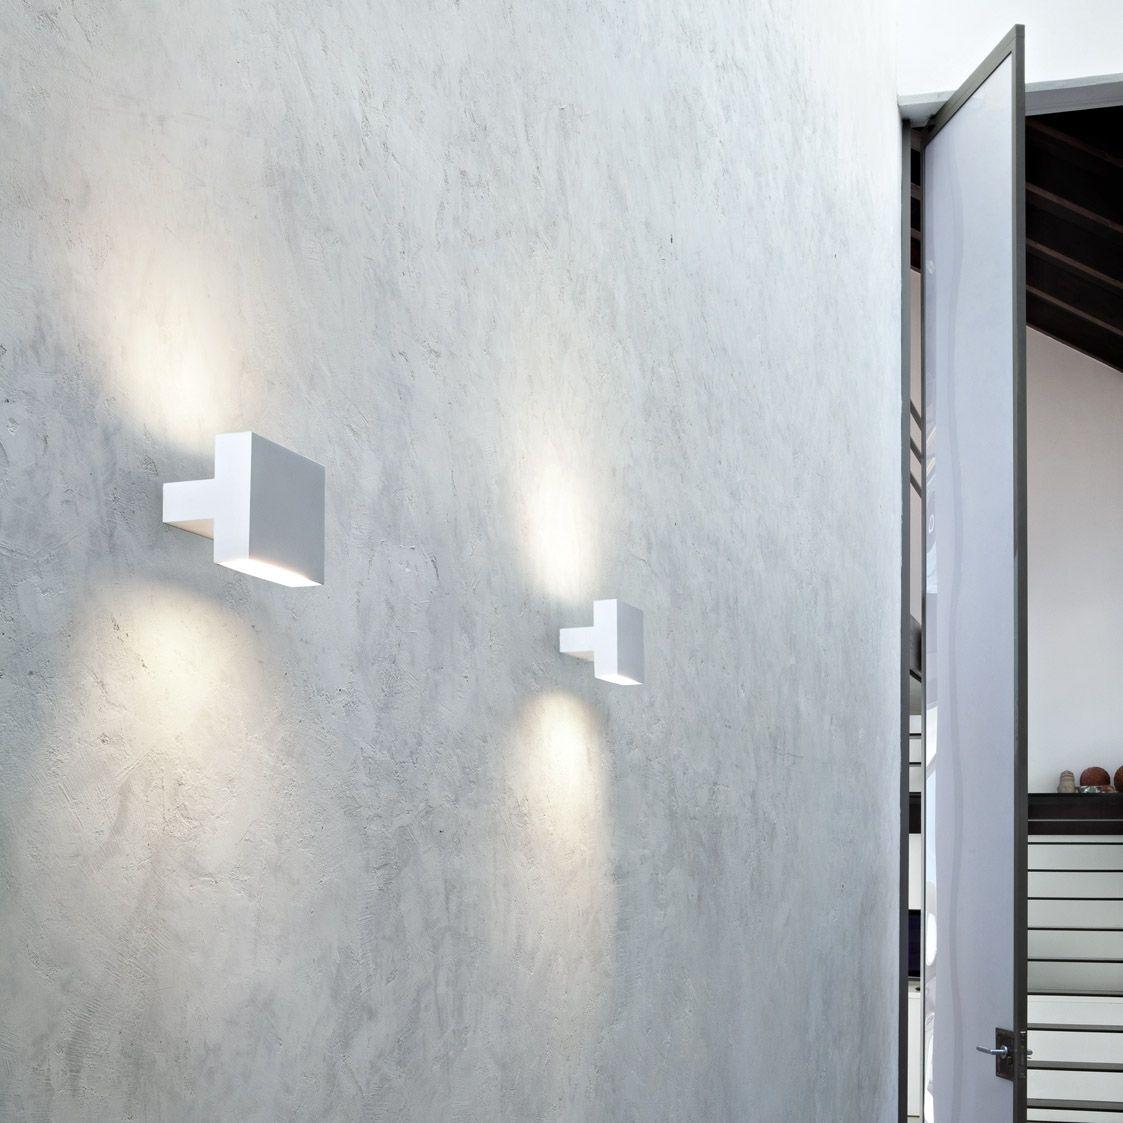 Tight Light By Piero Lissoni Contemporary Designer Lighting By Flos Modern Wall Lamp Design Wall Lamp Design Wall Lights